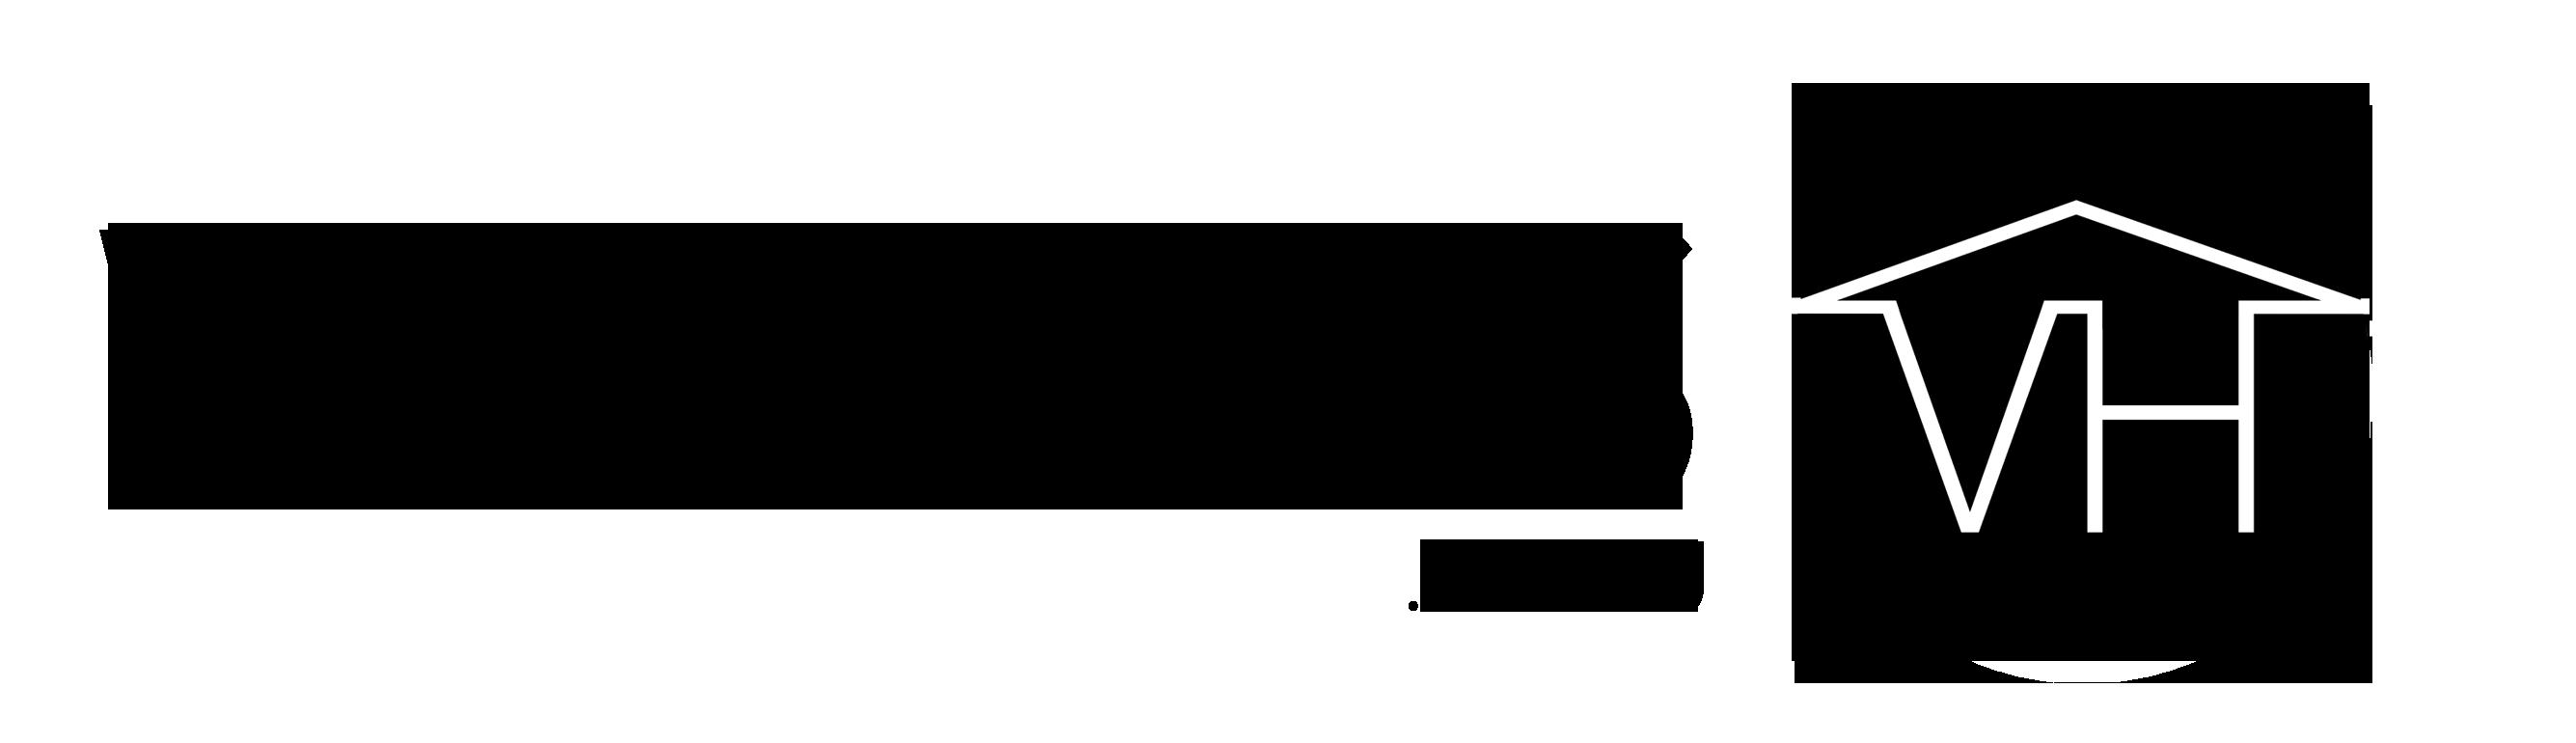 Logo New Transparent.png